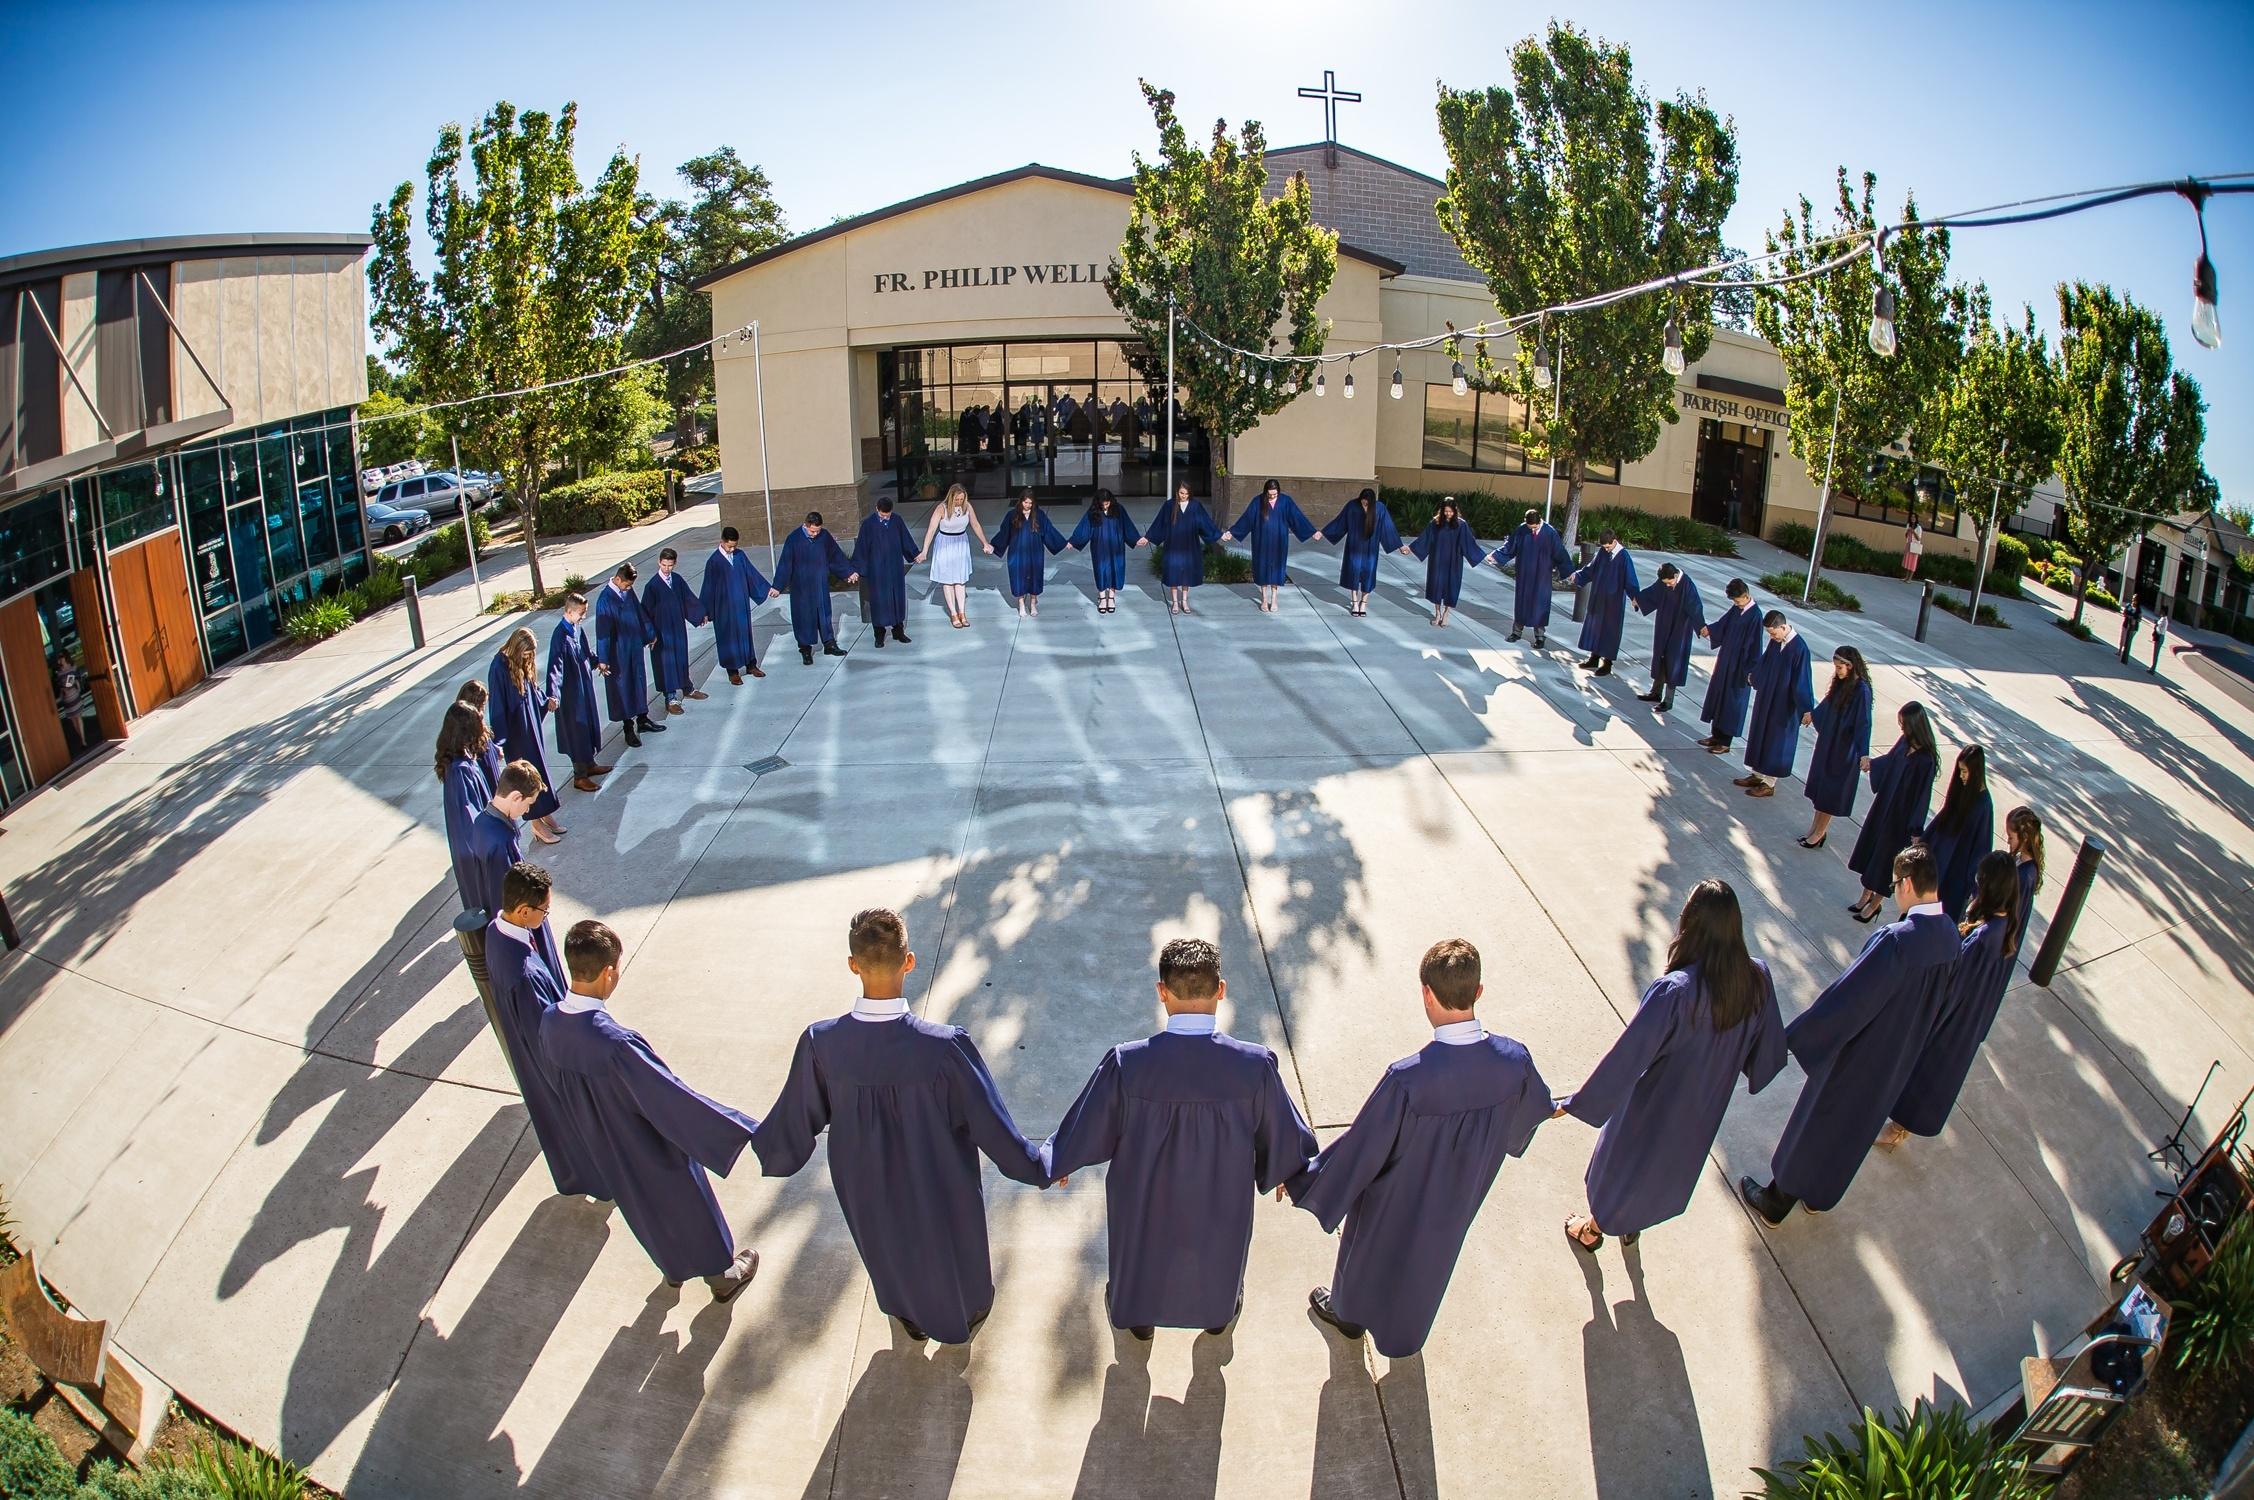 Saint Elizabeth Ann Seton Catholic School, 9539 Racquet Court, Elk_School Calendar Elk Grove